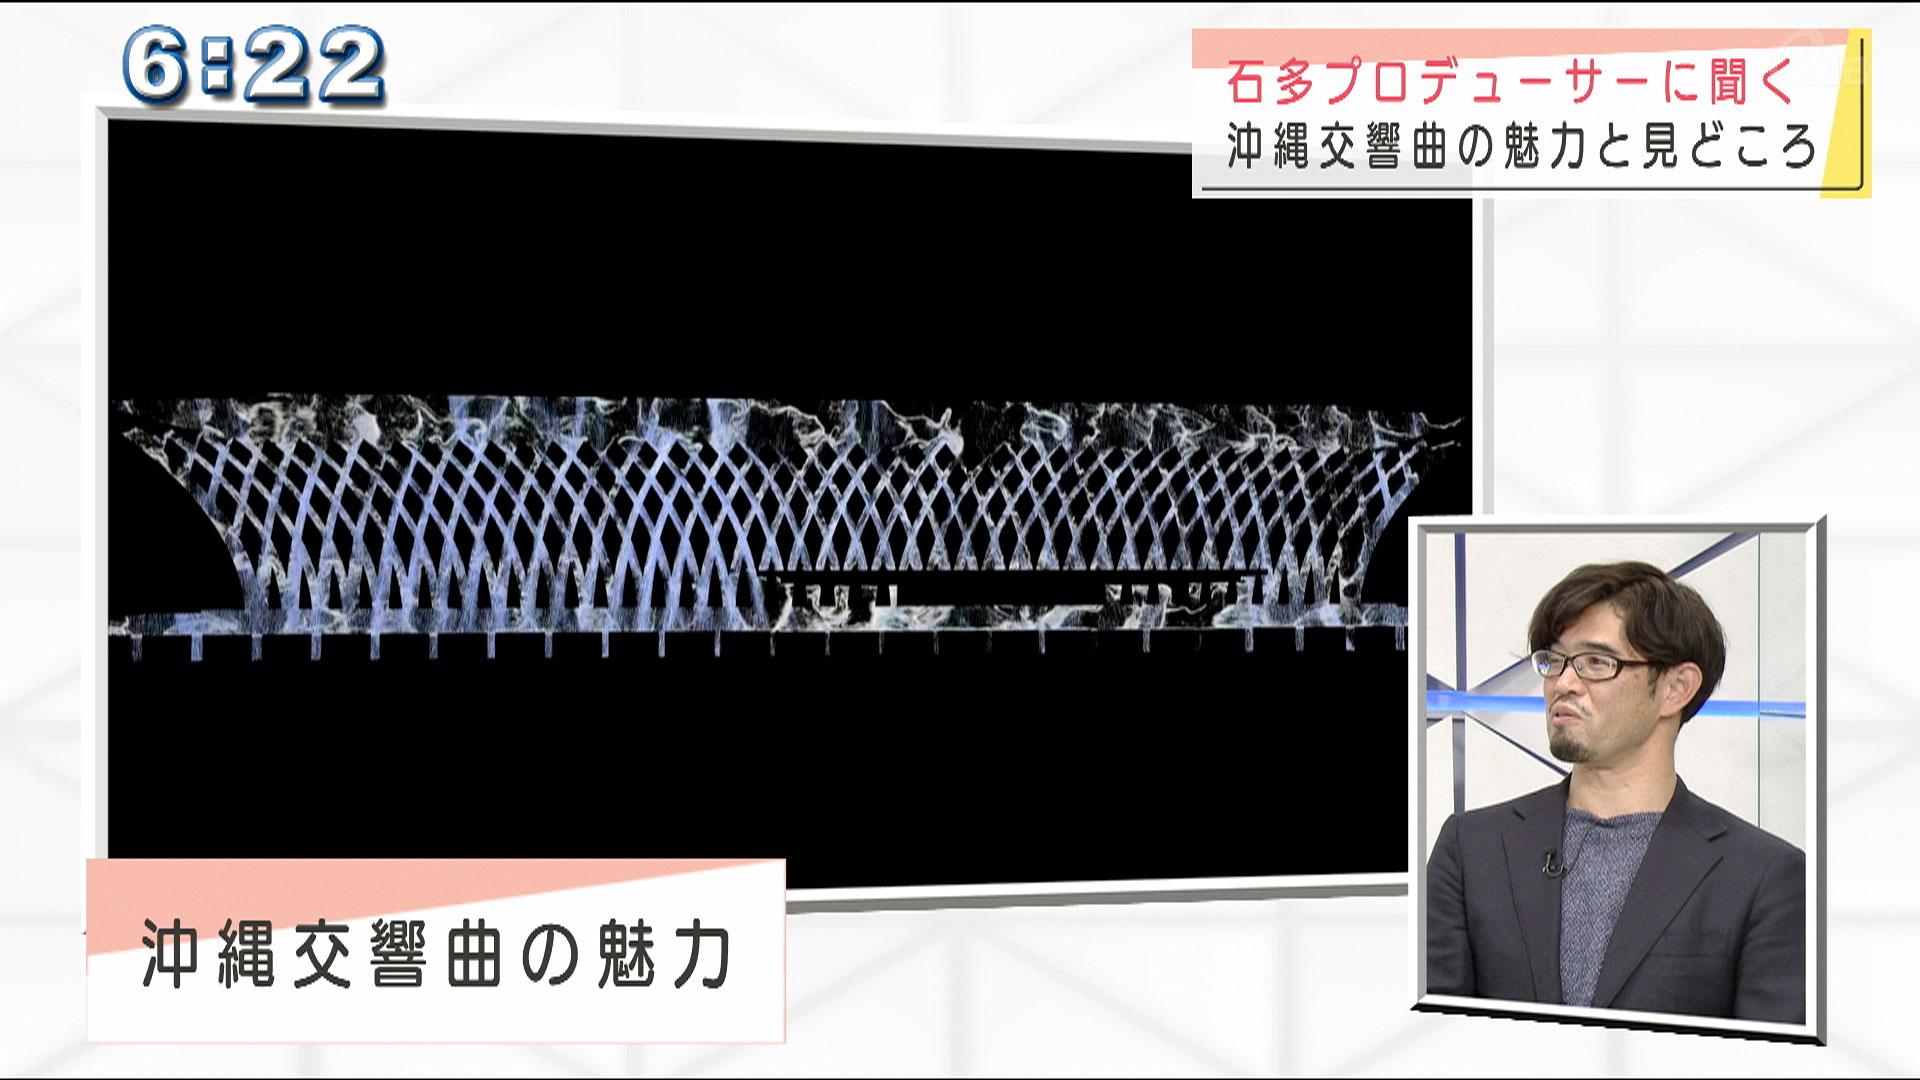 国内最大級の映像ショー「沖縄交響曲」